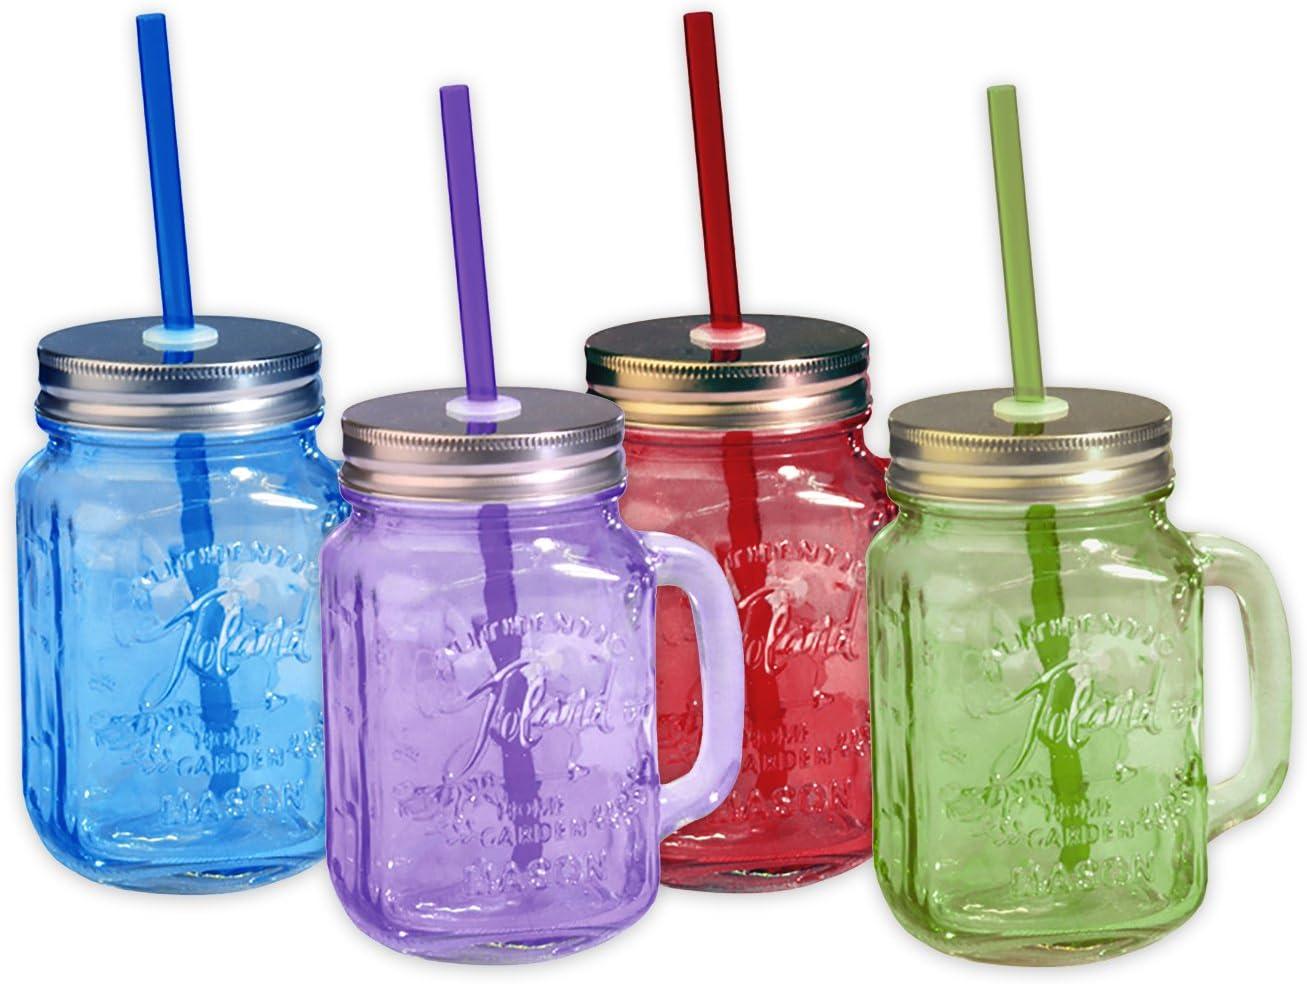 Toland Home Garden Mason Jar 16 oz Mug (Set of 4), Red/Purple/Blue/Green, 1 pint - S340001